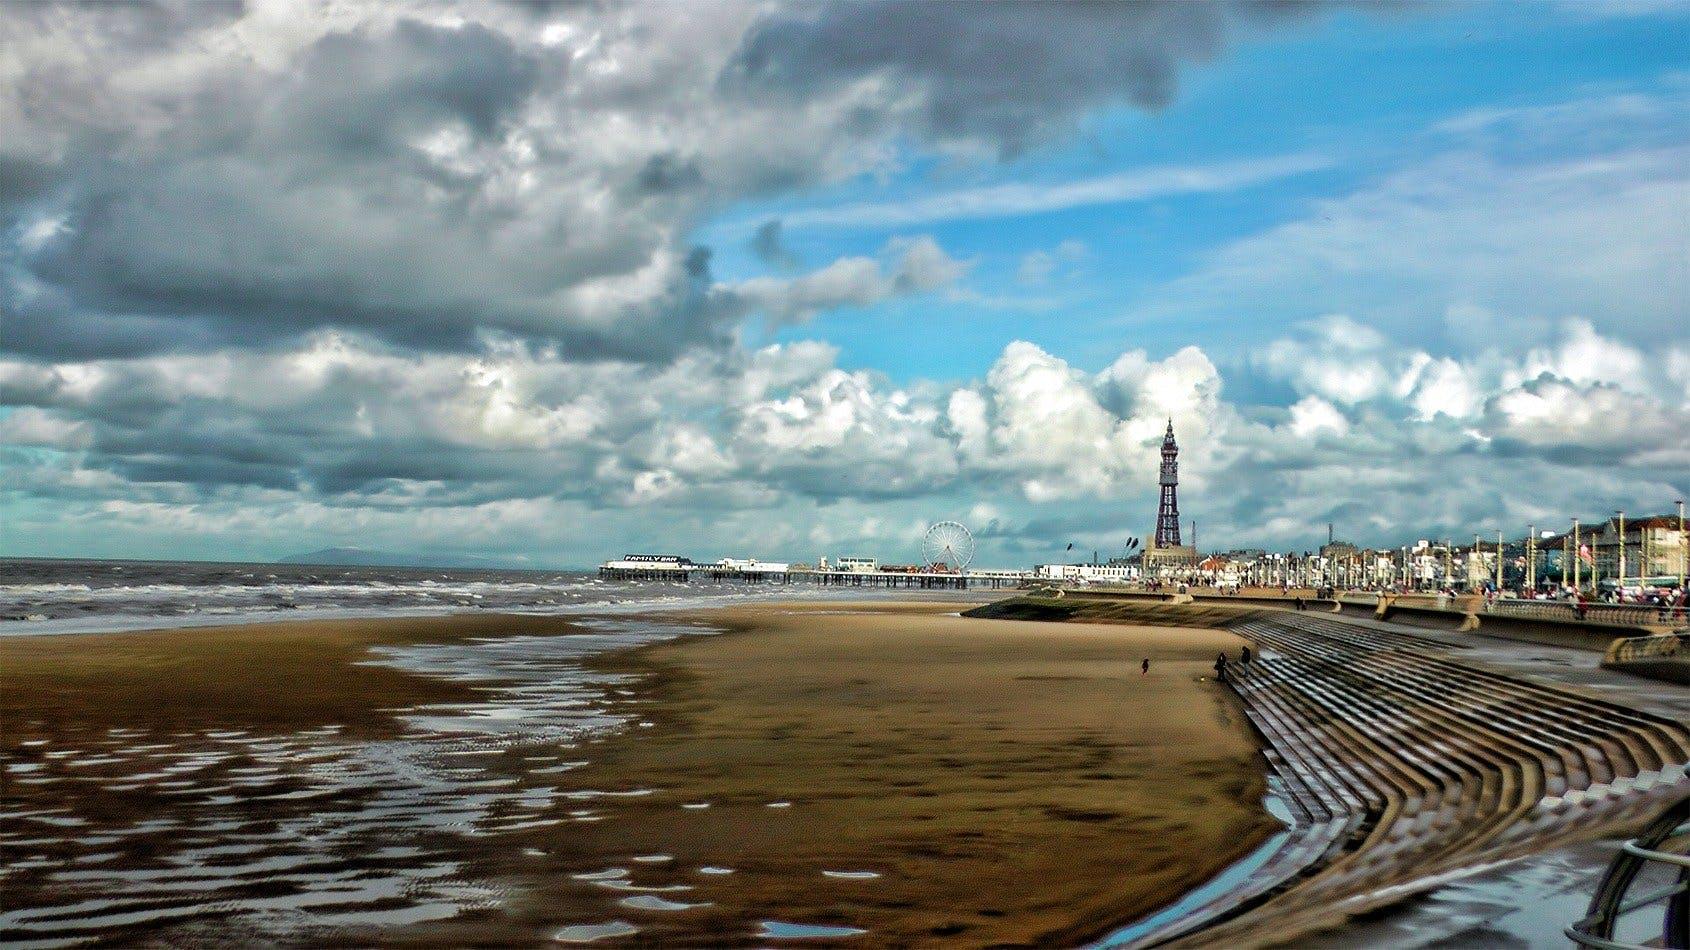 Vantage Point, Amy Johnson Way, Blackpool, Office To Let - blackpool-64043 (1).jpg